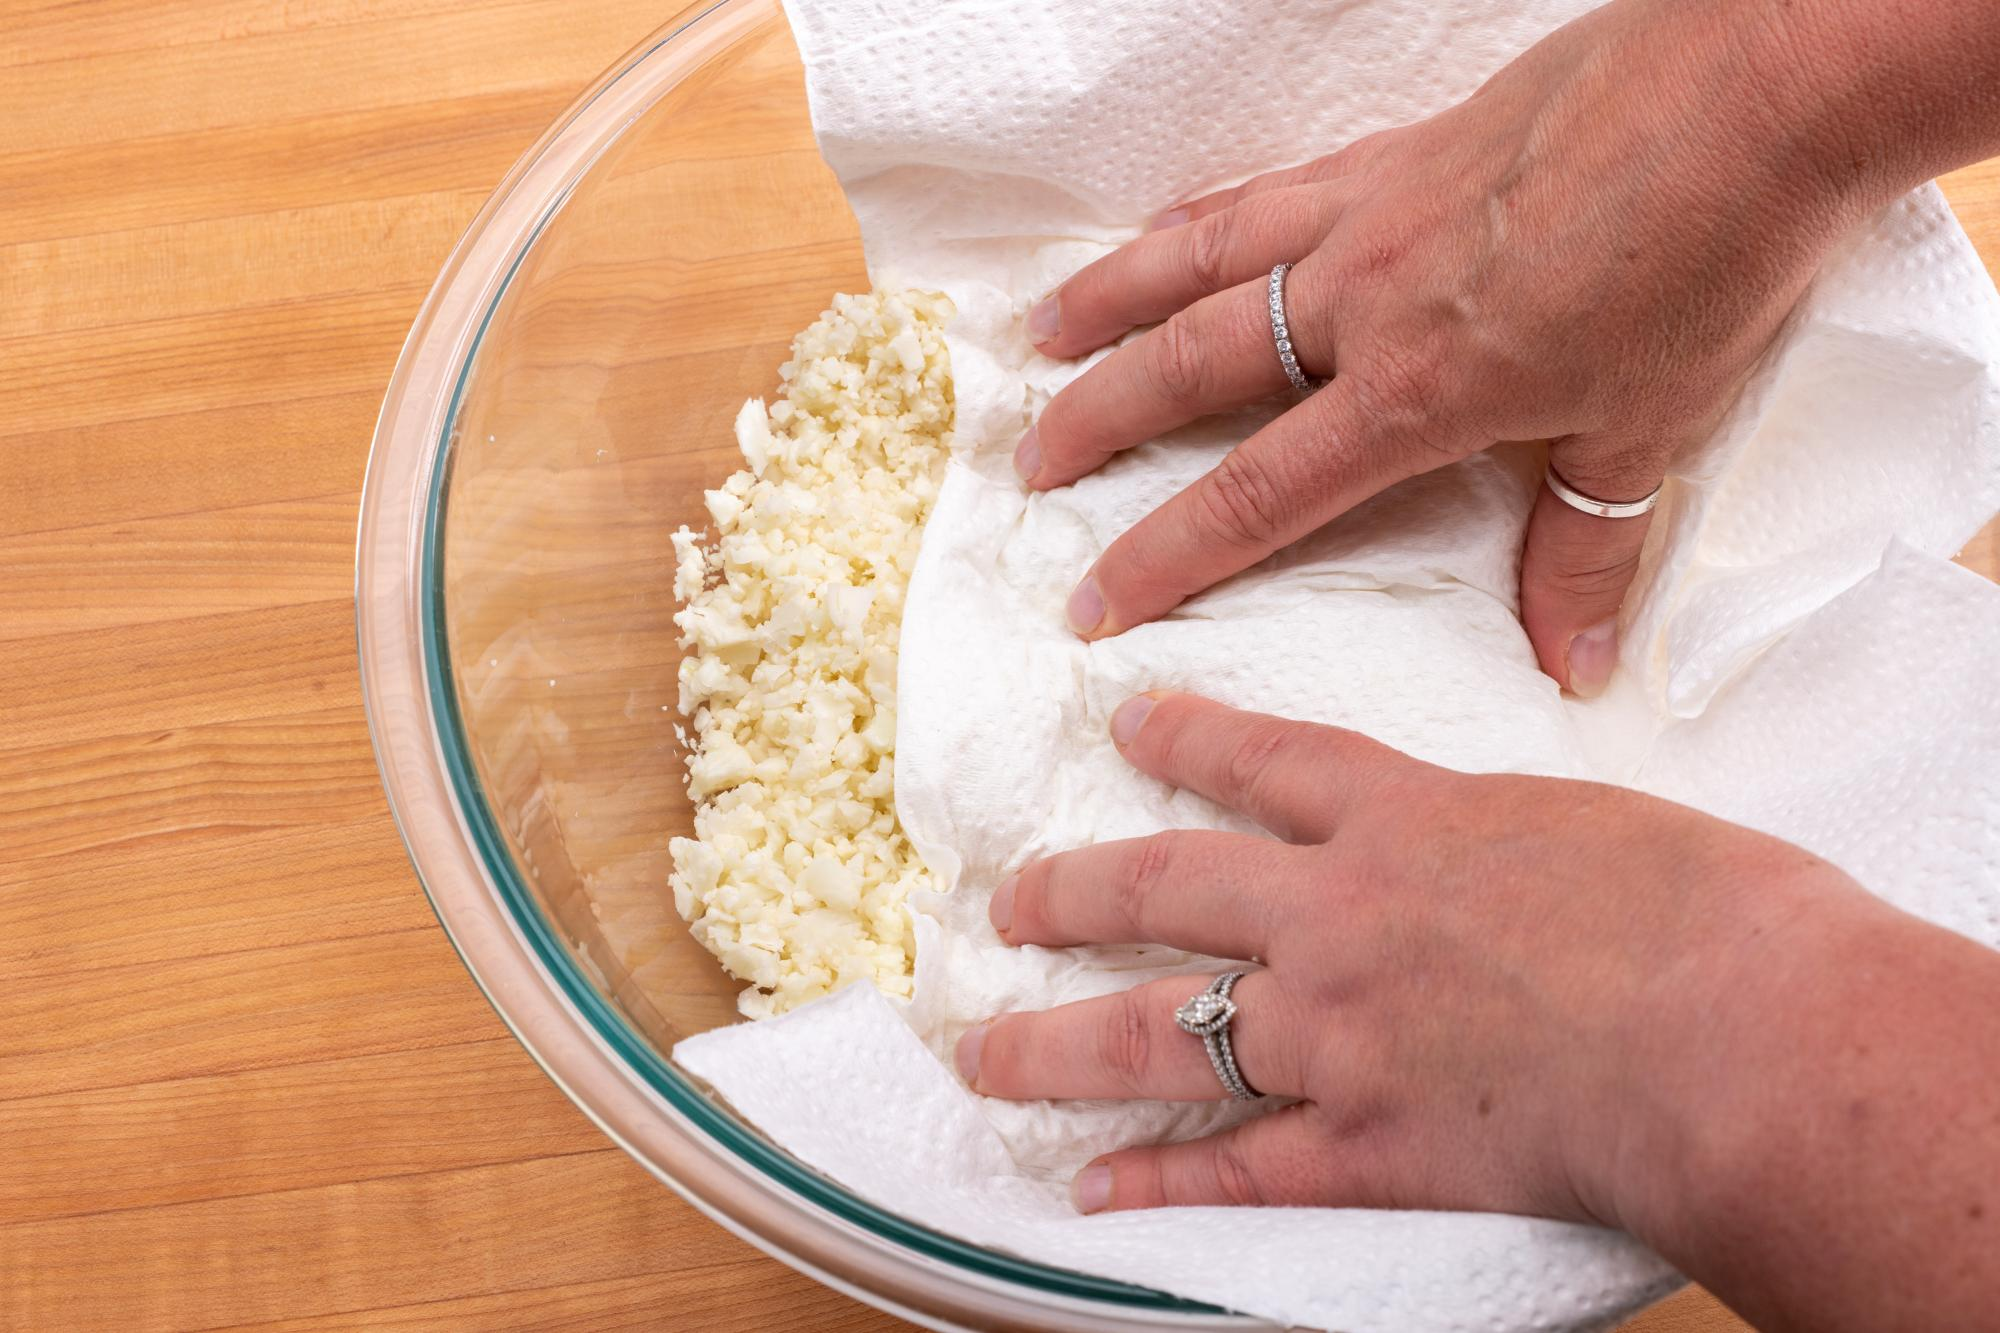 Patting dry the riced cauliflower.